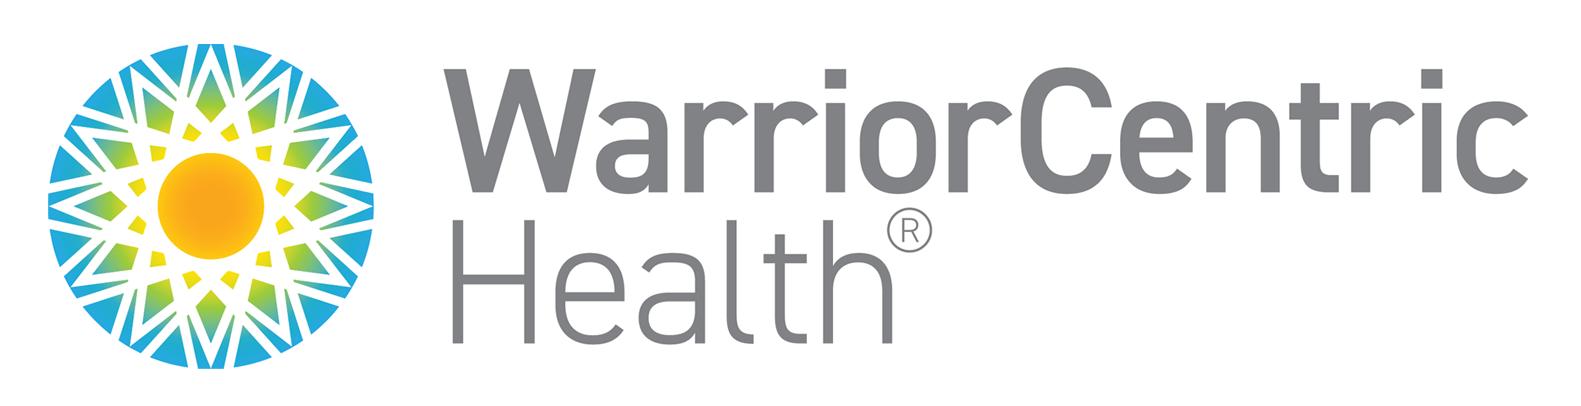 warrior centric health logo